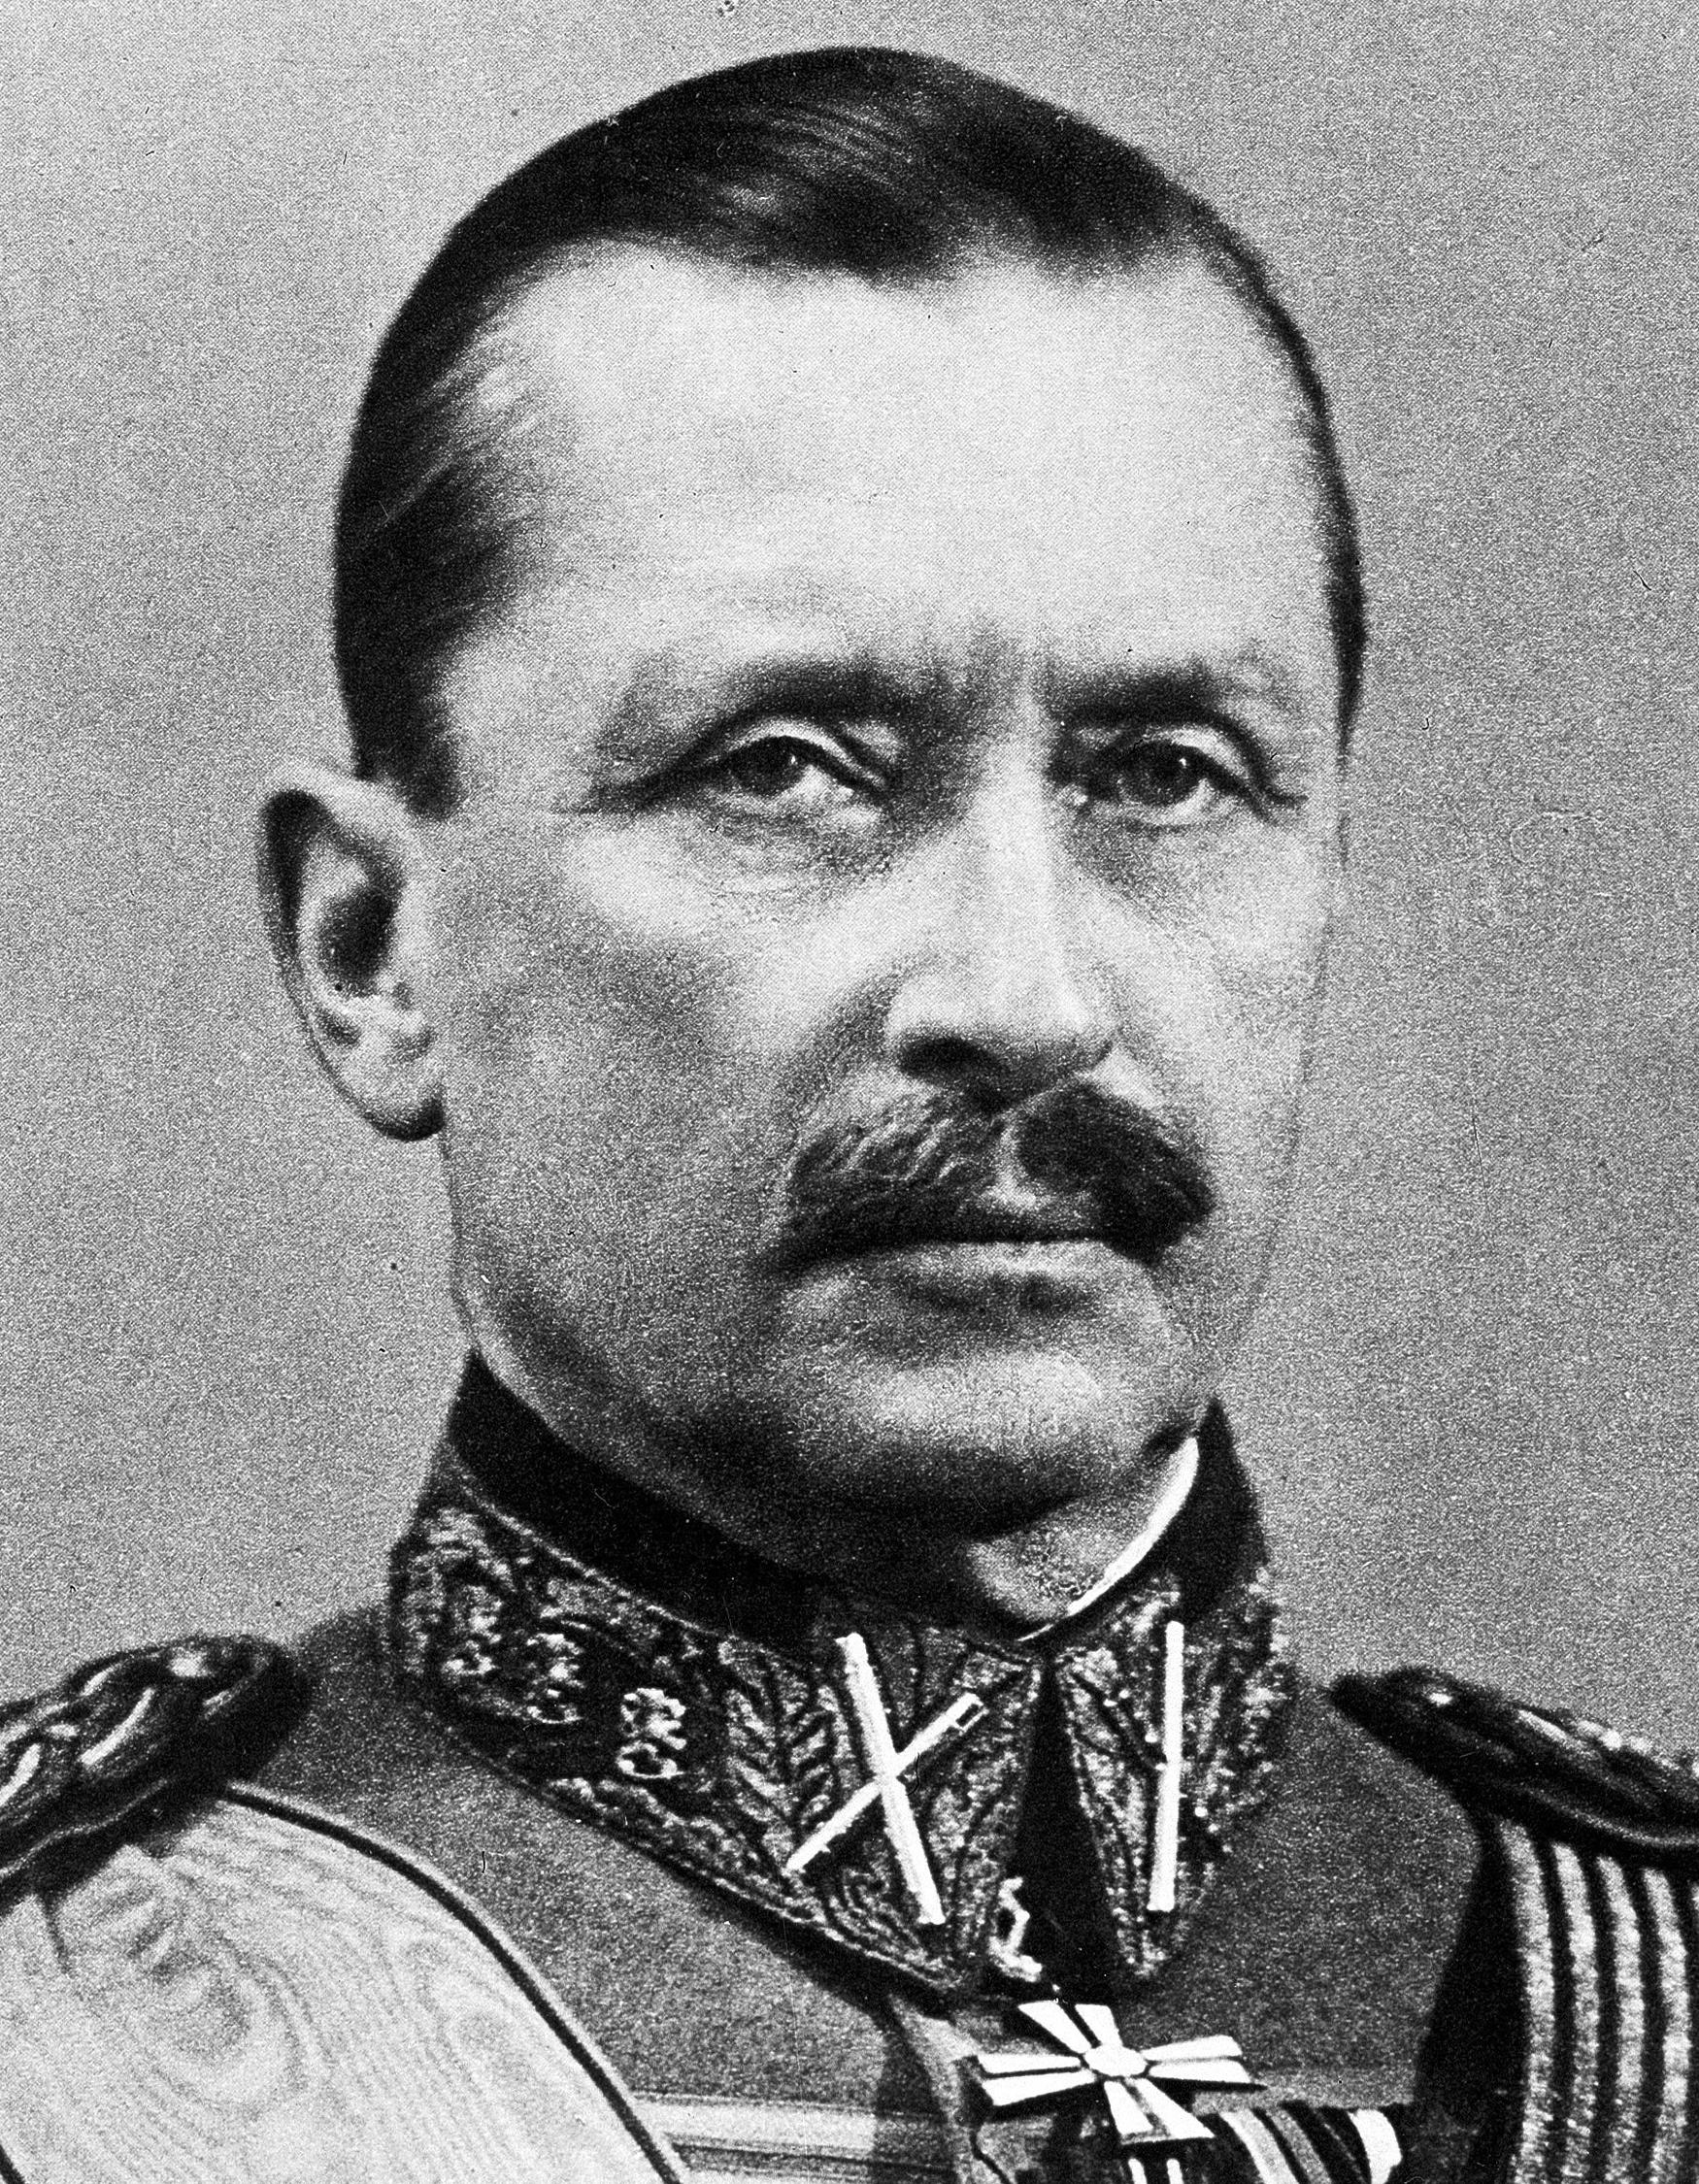 Carl Mannerheim